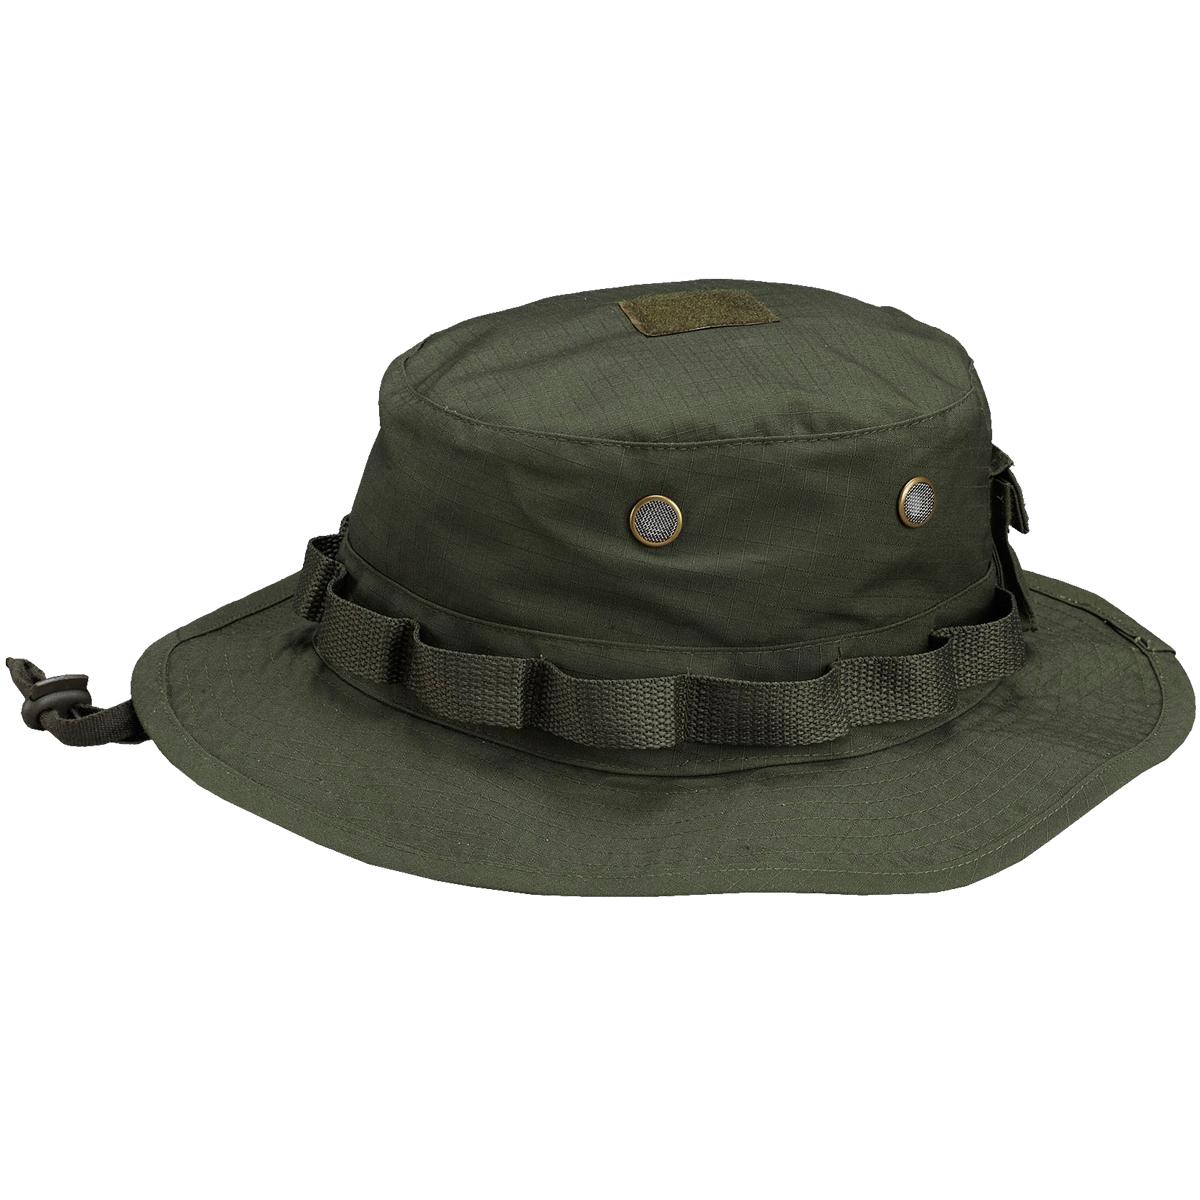 Pentagon Jungle Hat Ripstop Patrol Military Combat Forces Headgear Olive Green